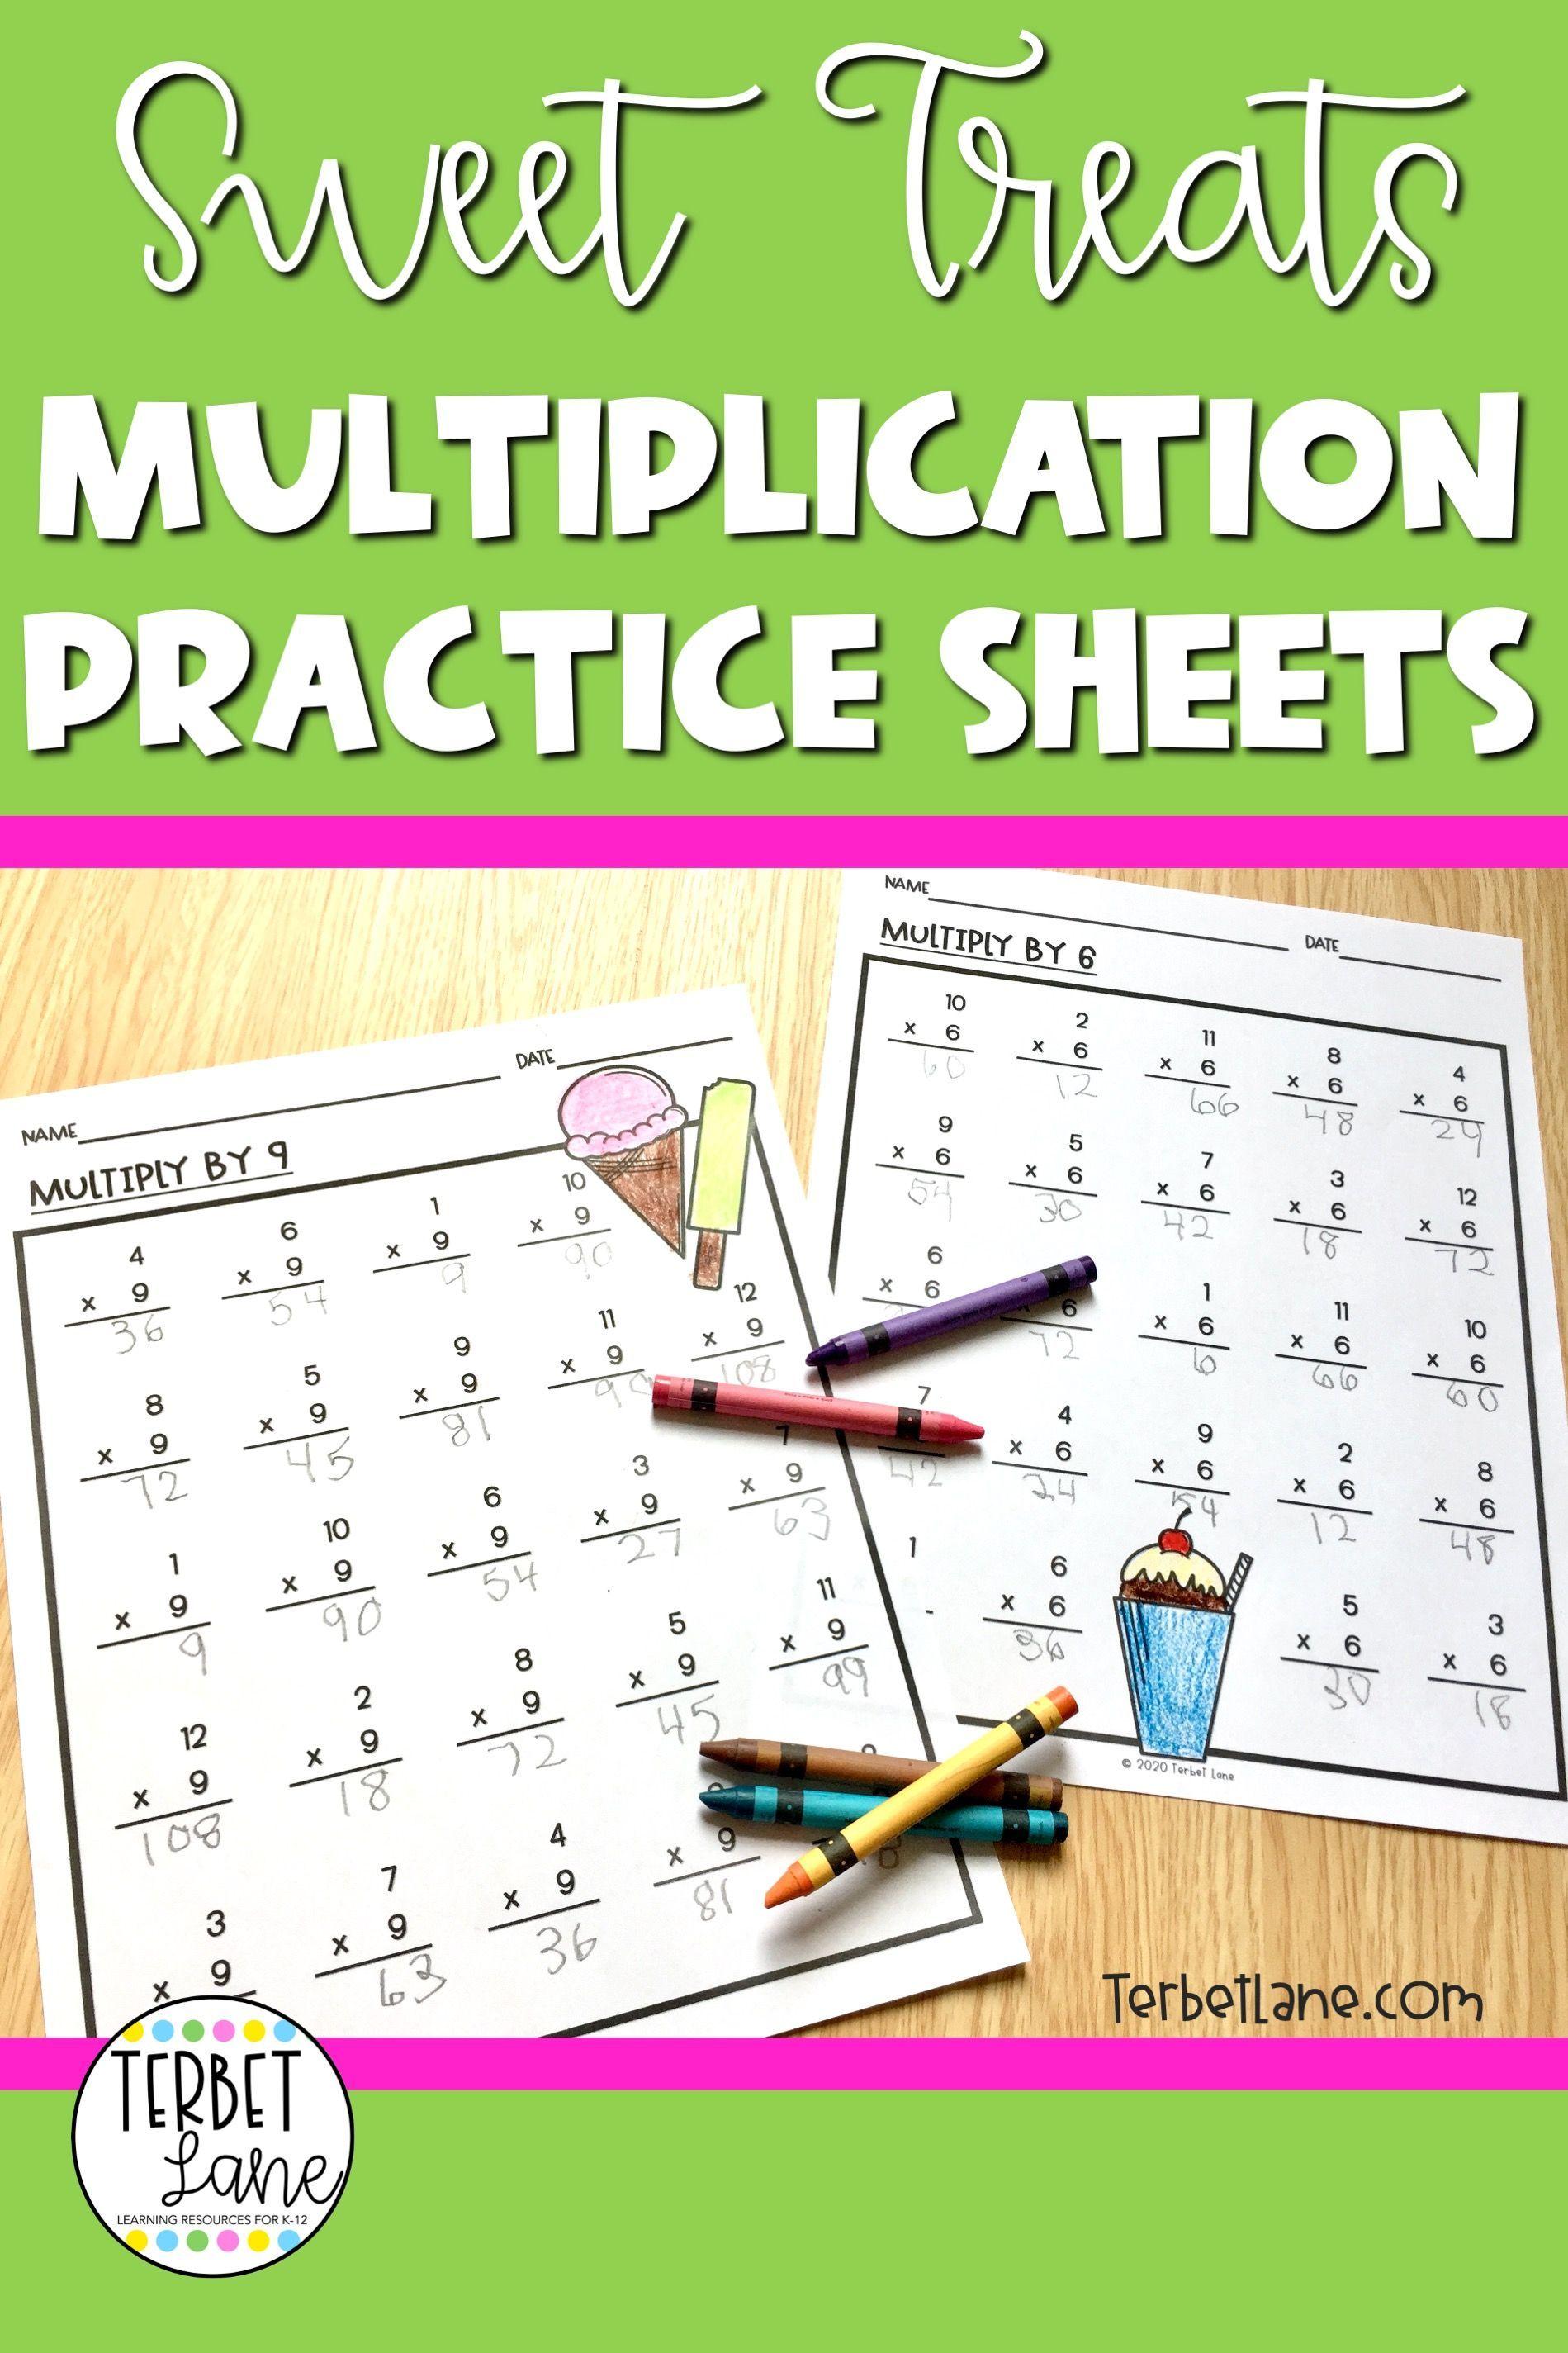 Sweet Treats Multiplication Worksheets Distance Learning Kindergarten Math Activities Multiplication Worksheets Fun Writing Prompts [ 2849 x 1899 Pixel ]